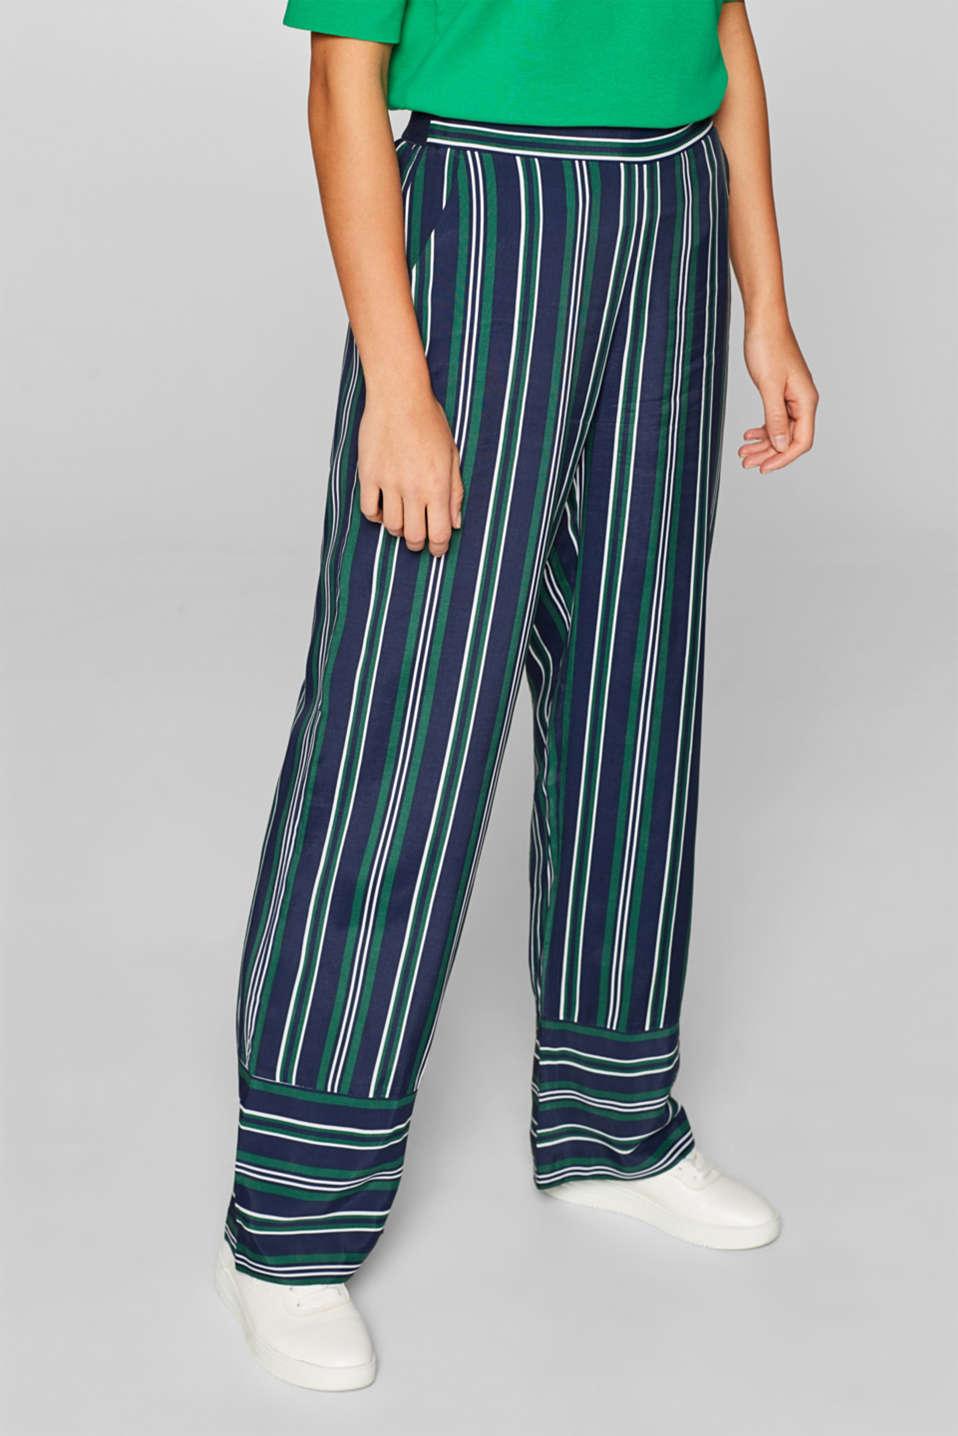 Pants woven, DARK TEAL GREEN, detail image number 6